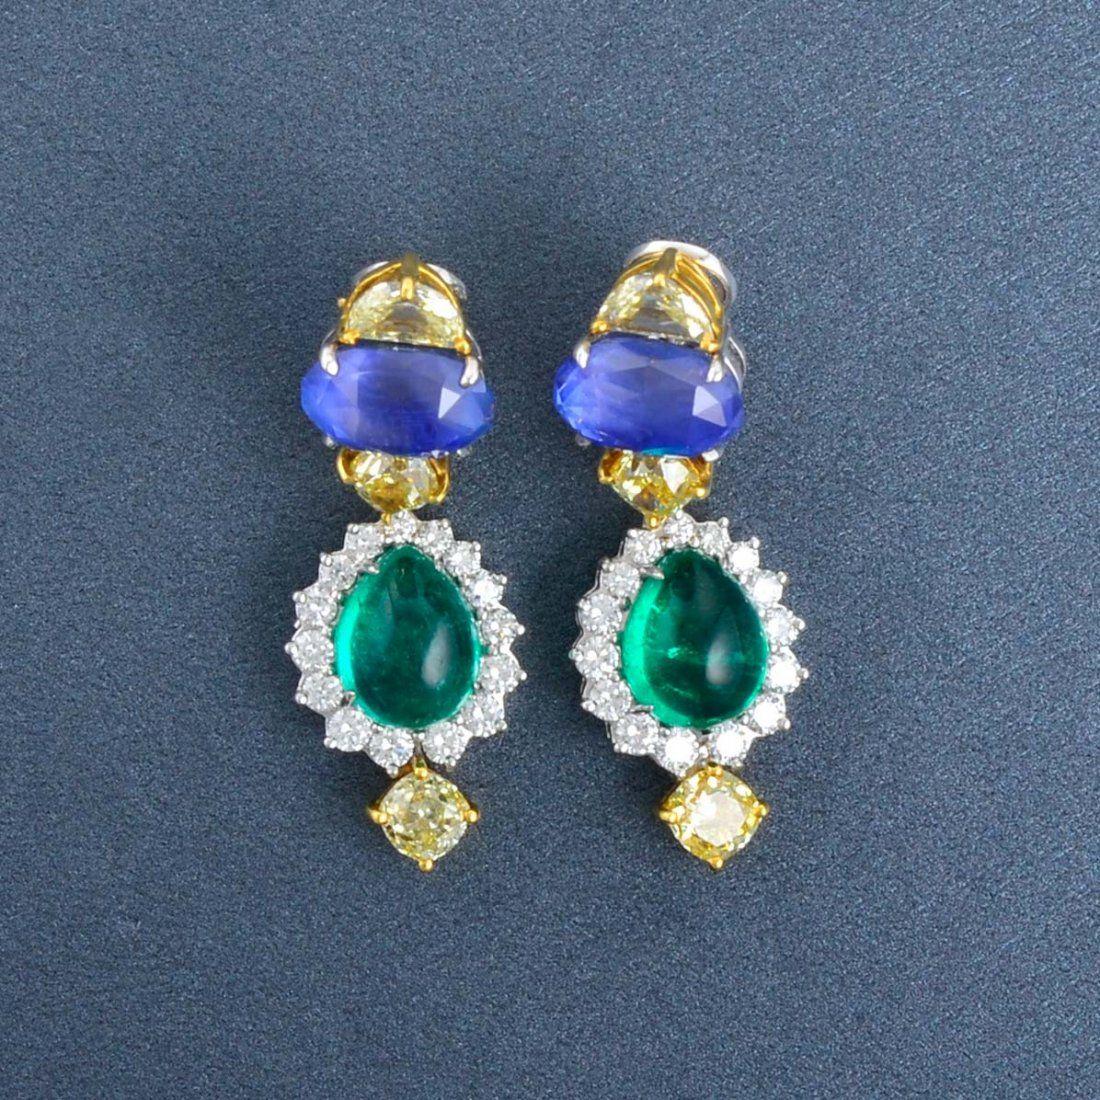 Pair of Multi Colored Gem Stone Earrings